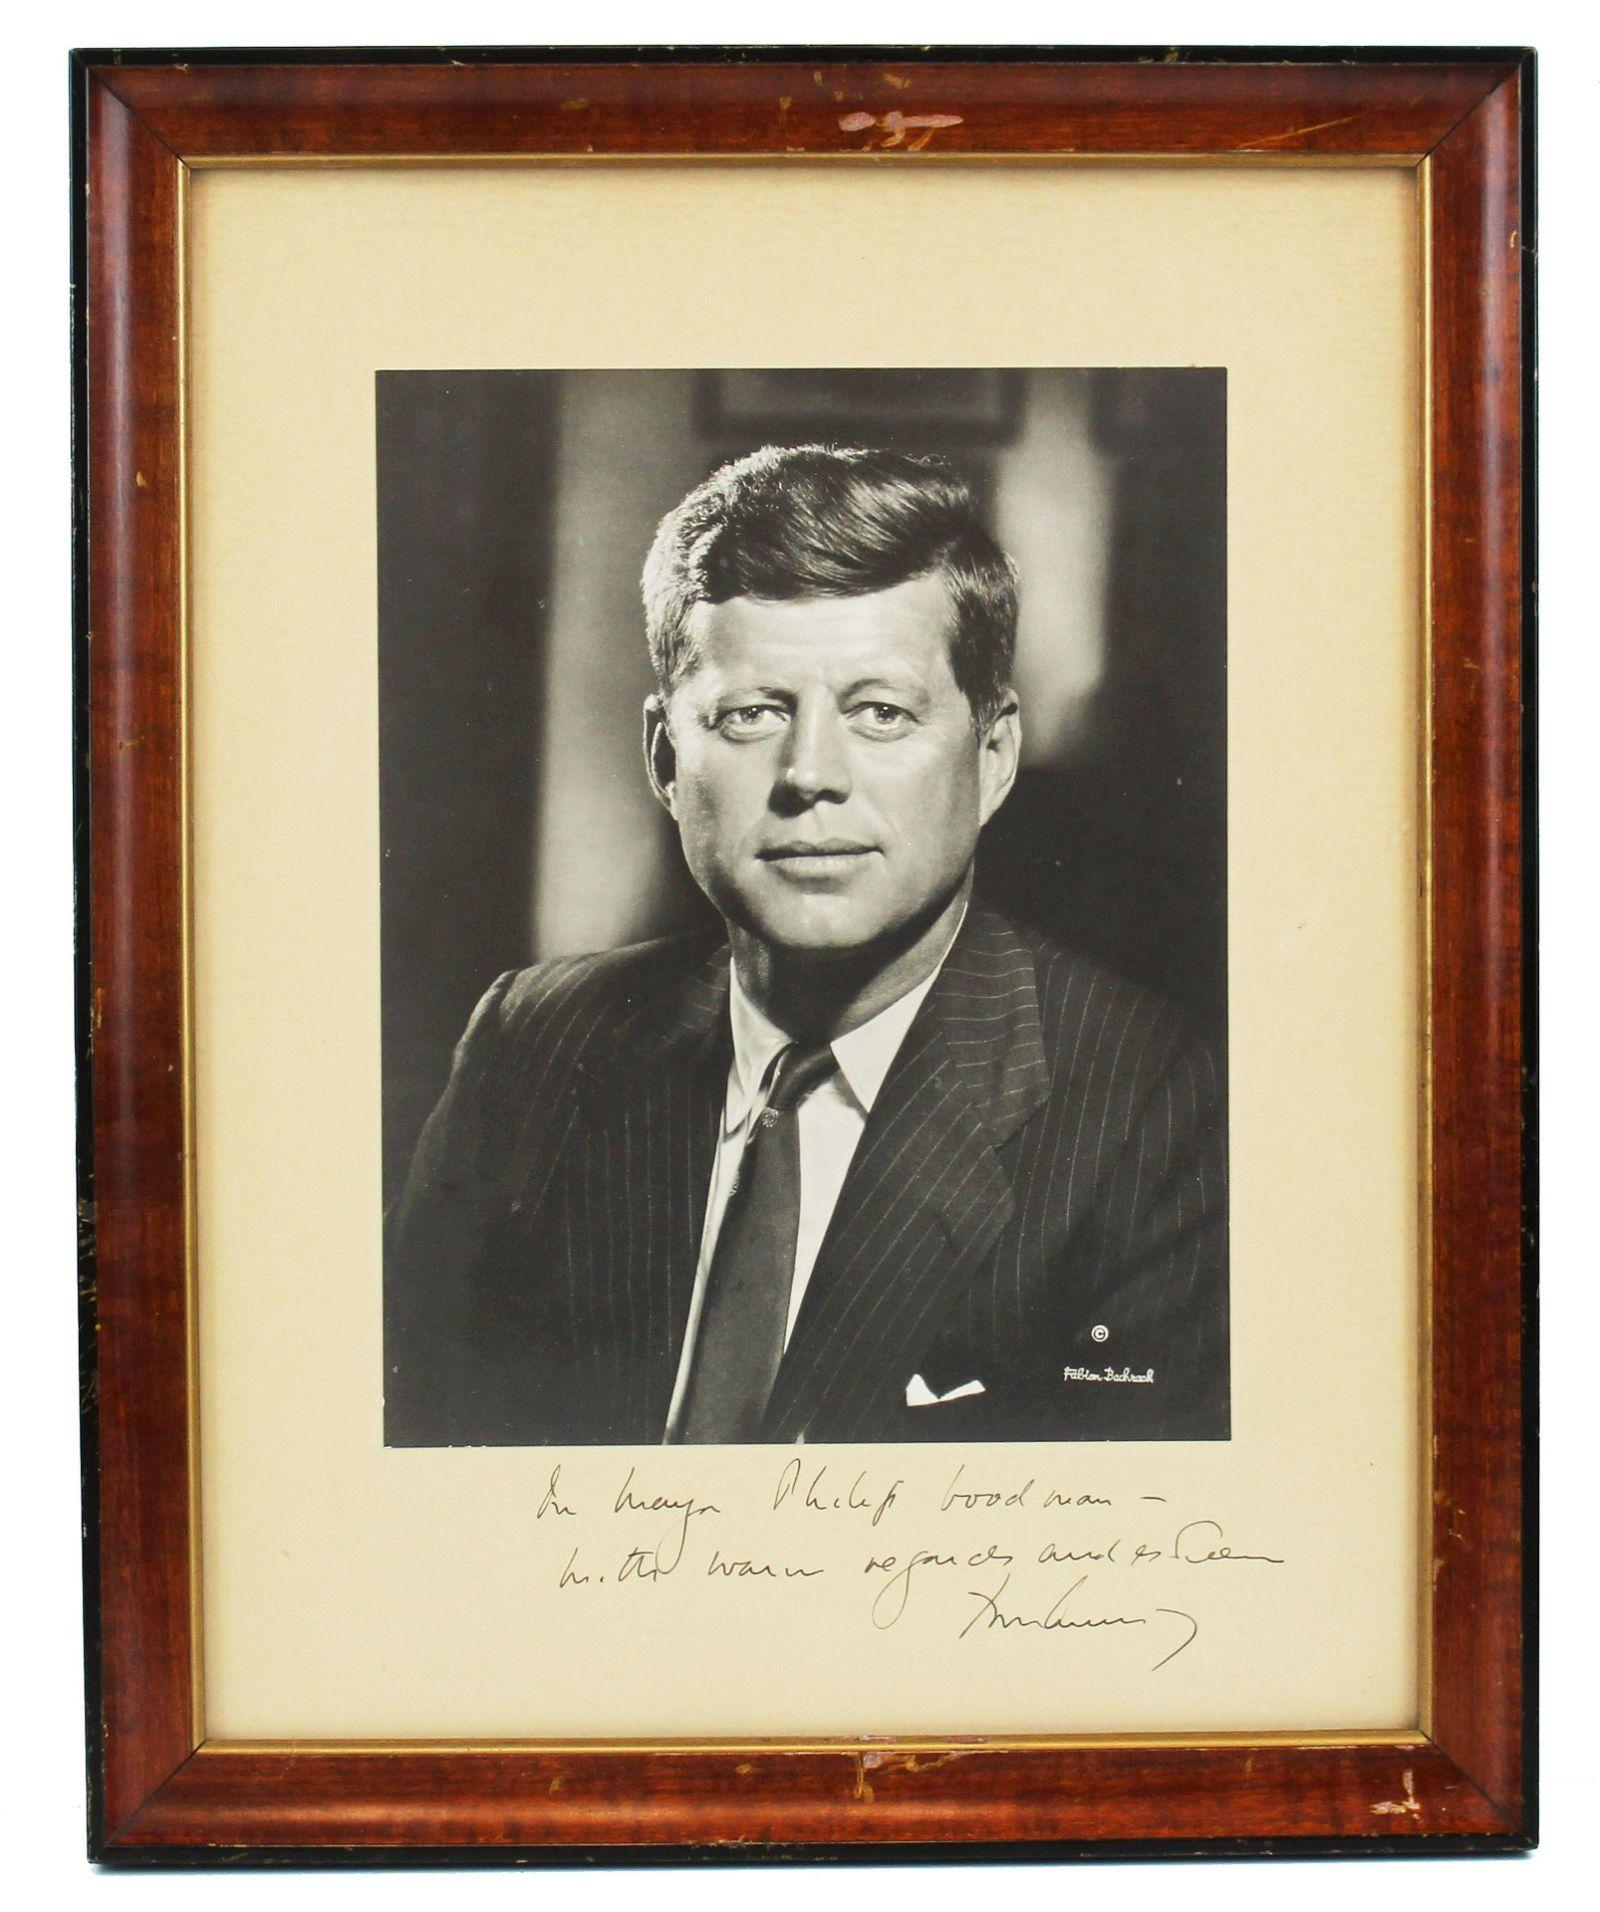 John F. Kennedy Signed & Inscribed Large Framed Photo,